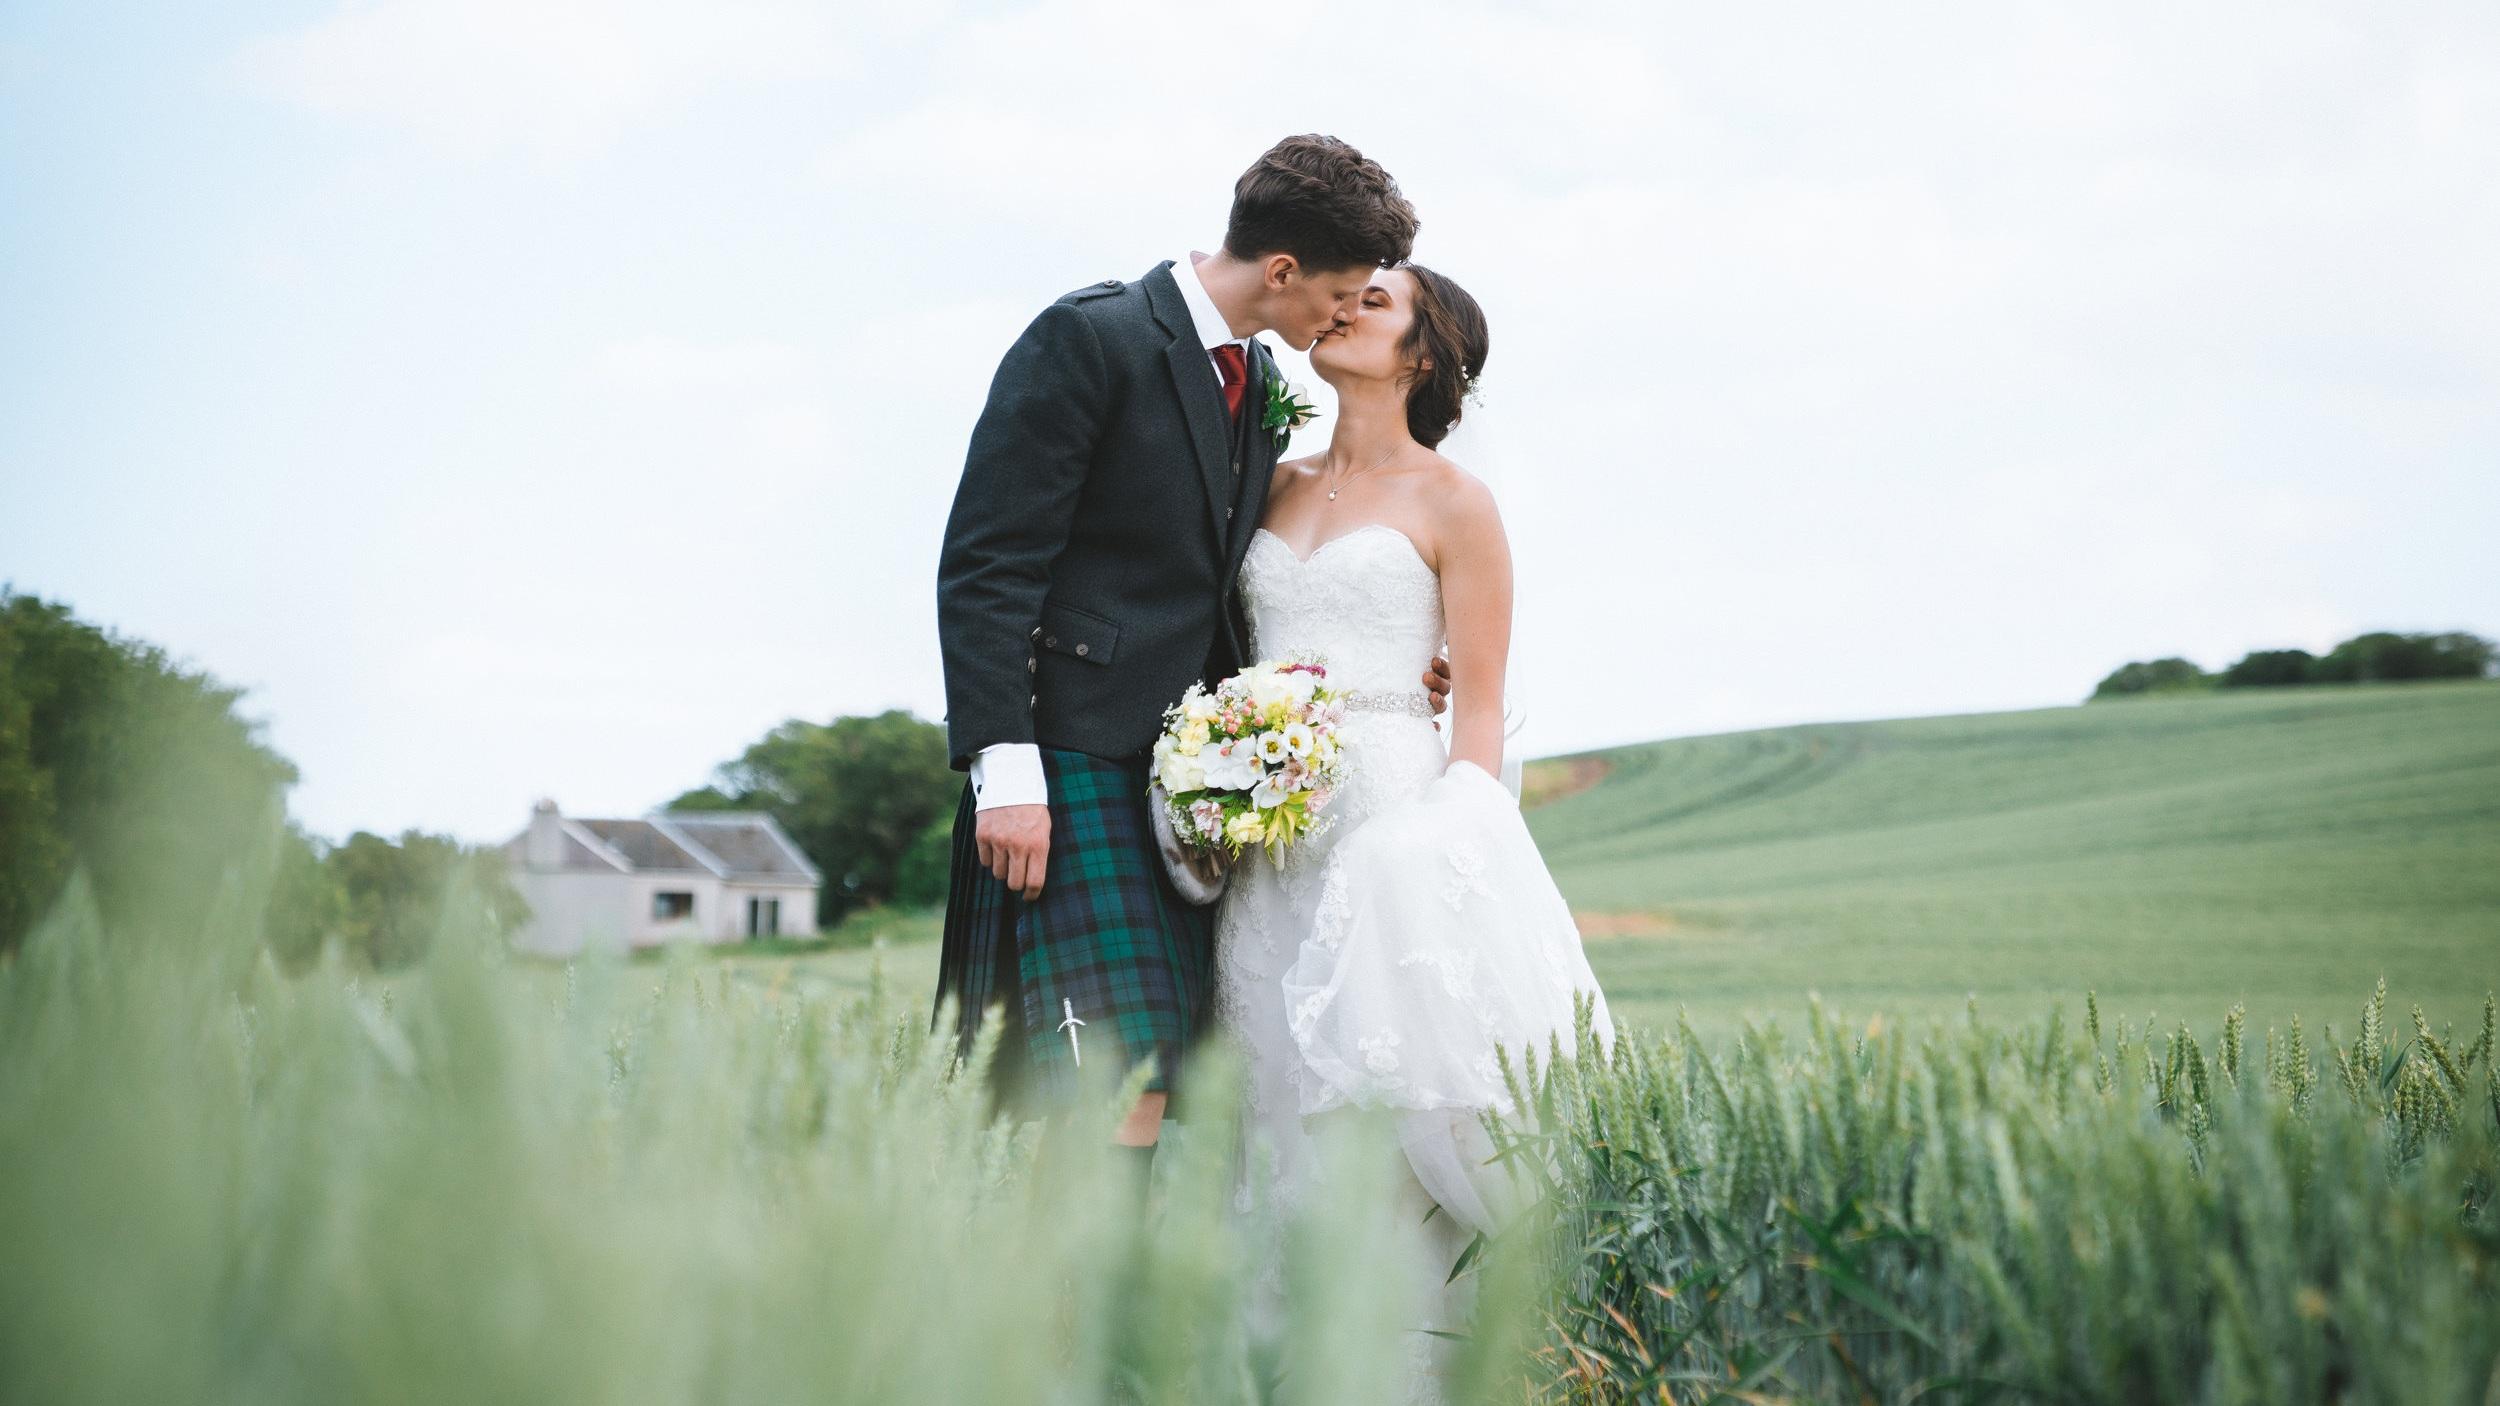 Sean & Priscilla - Wedding in the heart of edinburgh